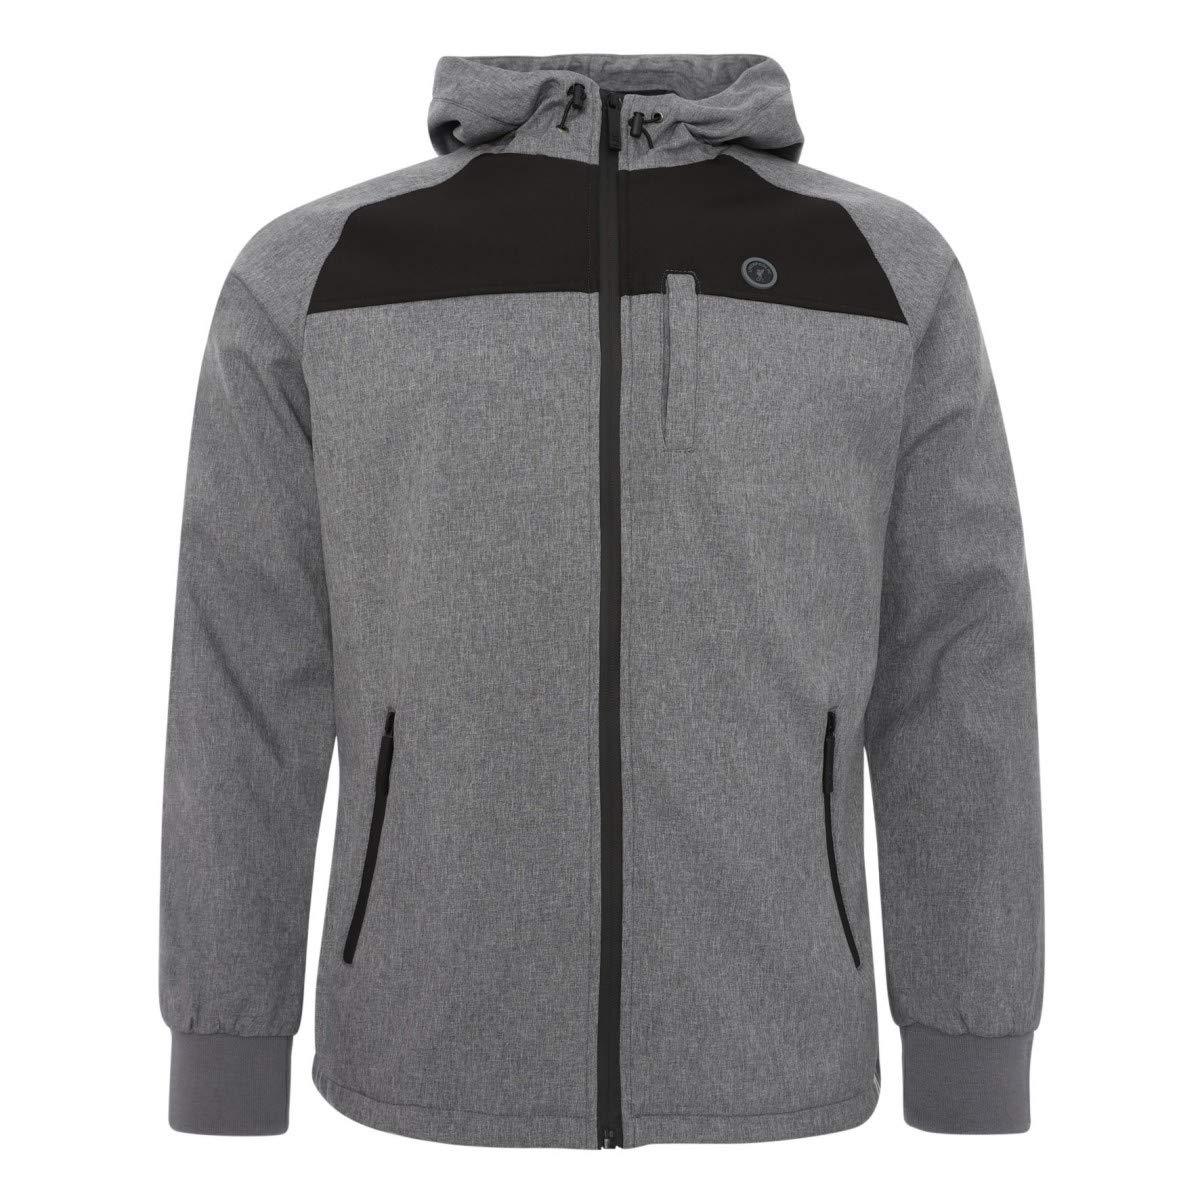 Liverpool FC Lightweight Hooded Jacket